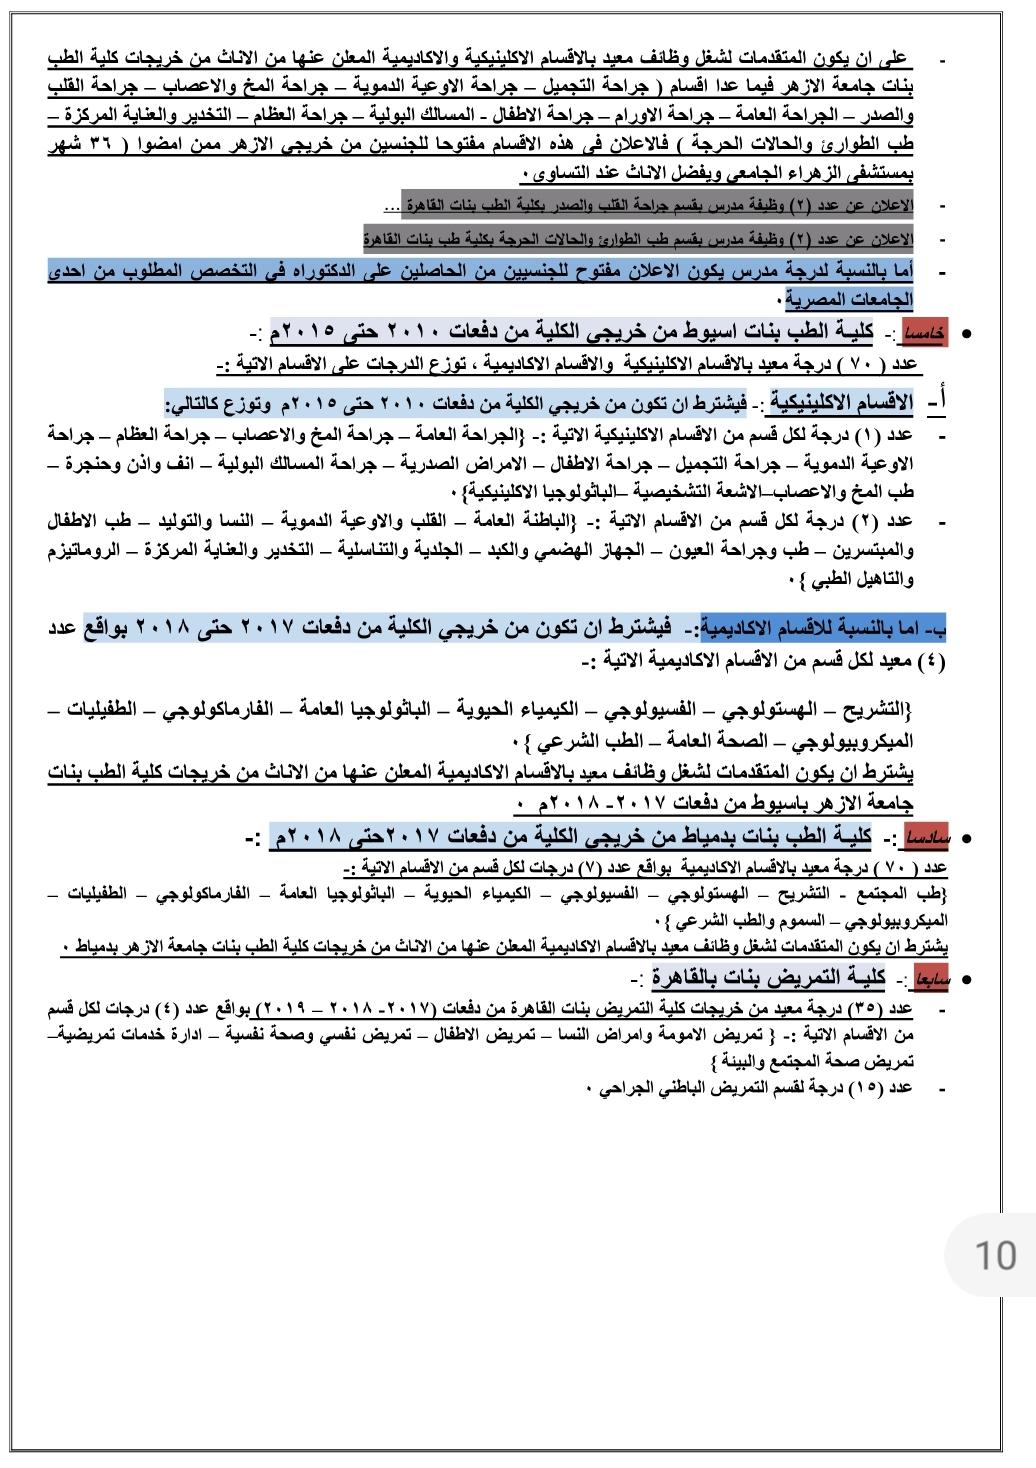 SmartSelect_٢٠٢١٠٣٢٥-١١٣١٣٩_Acrobat for Samsung